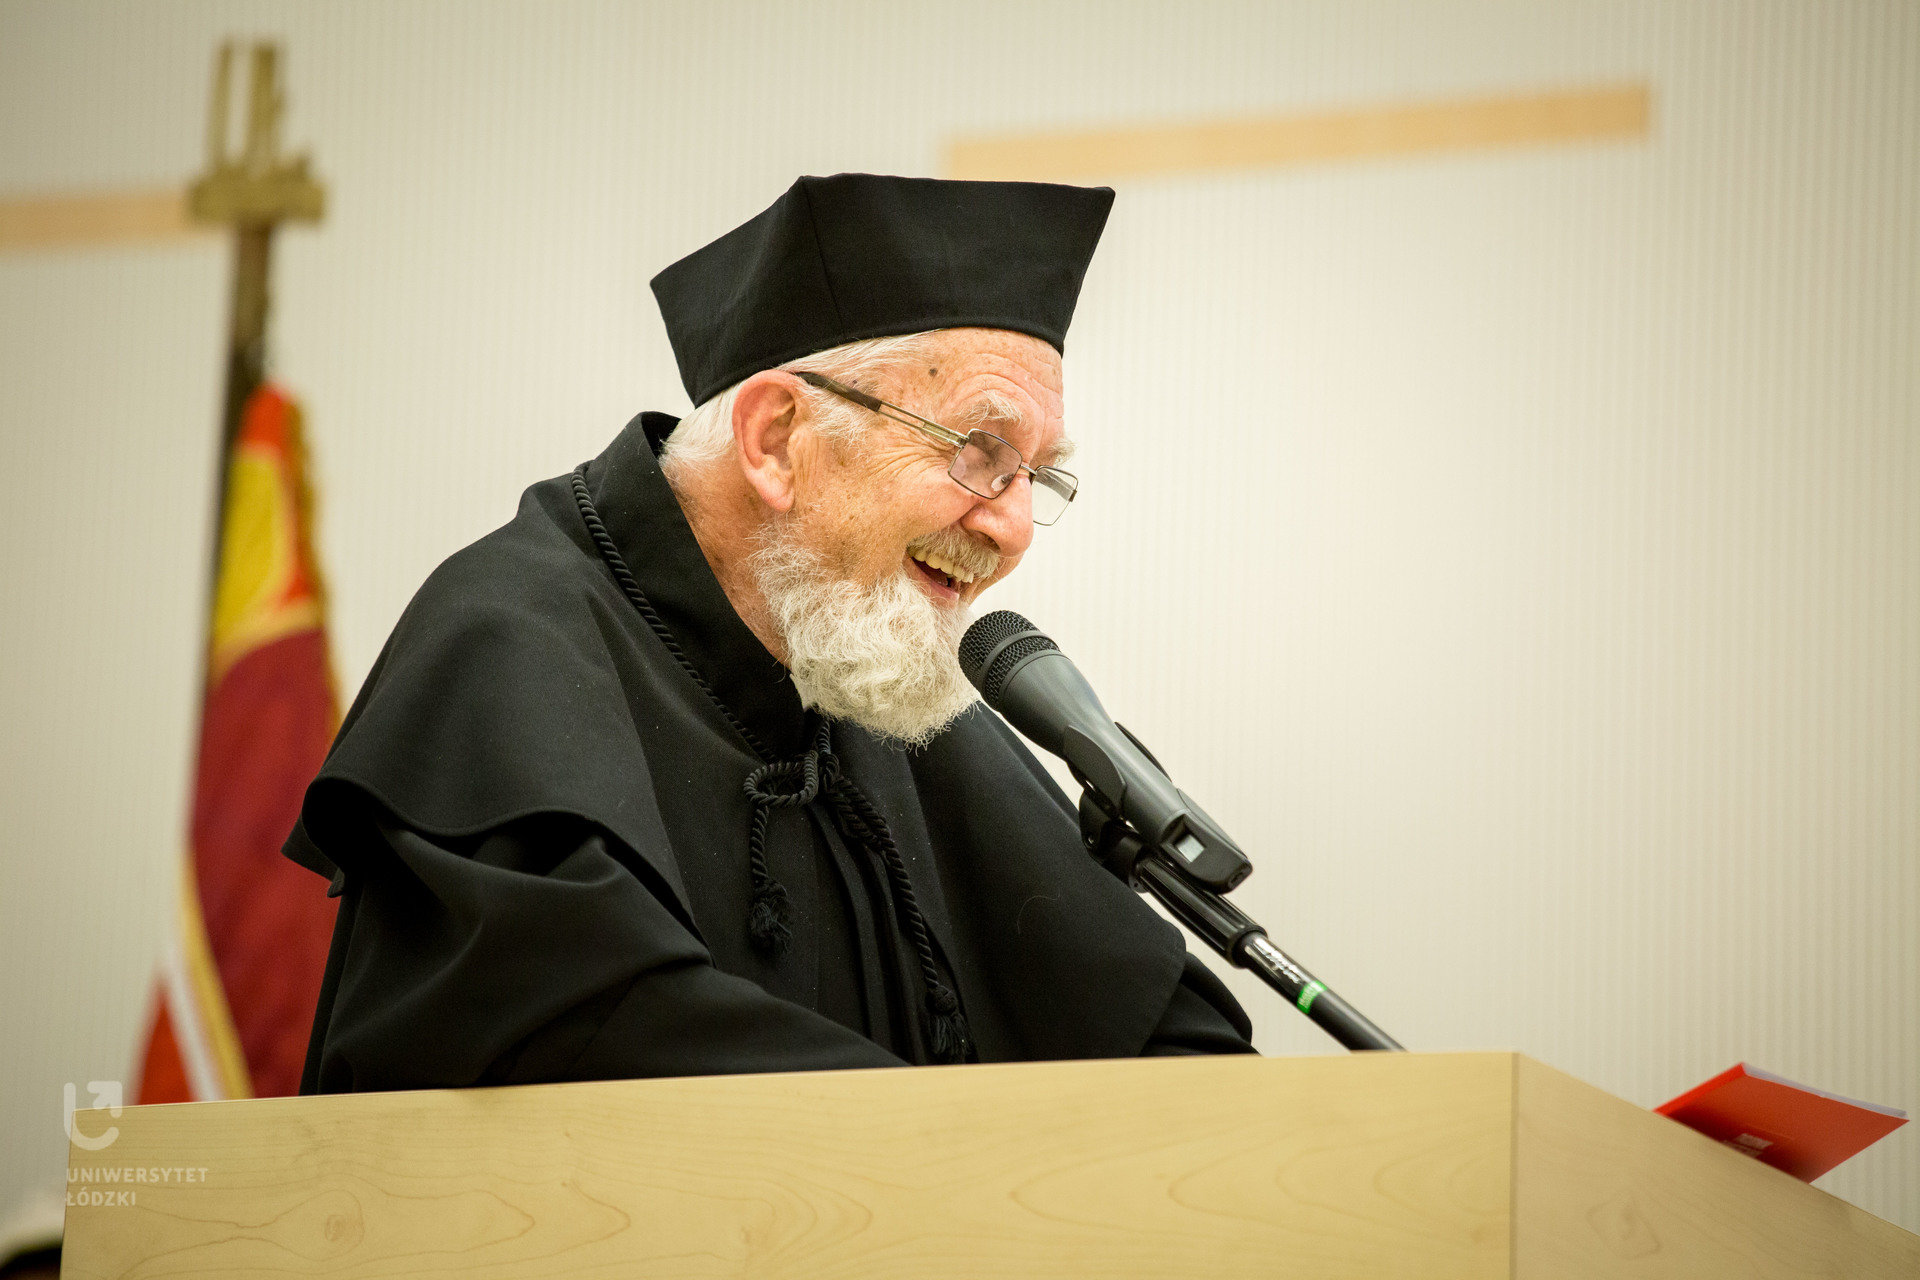 Ksiądz Adam Boniecki doktorem honoris causa Uniwersytetu Łódzkiego